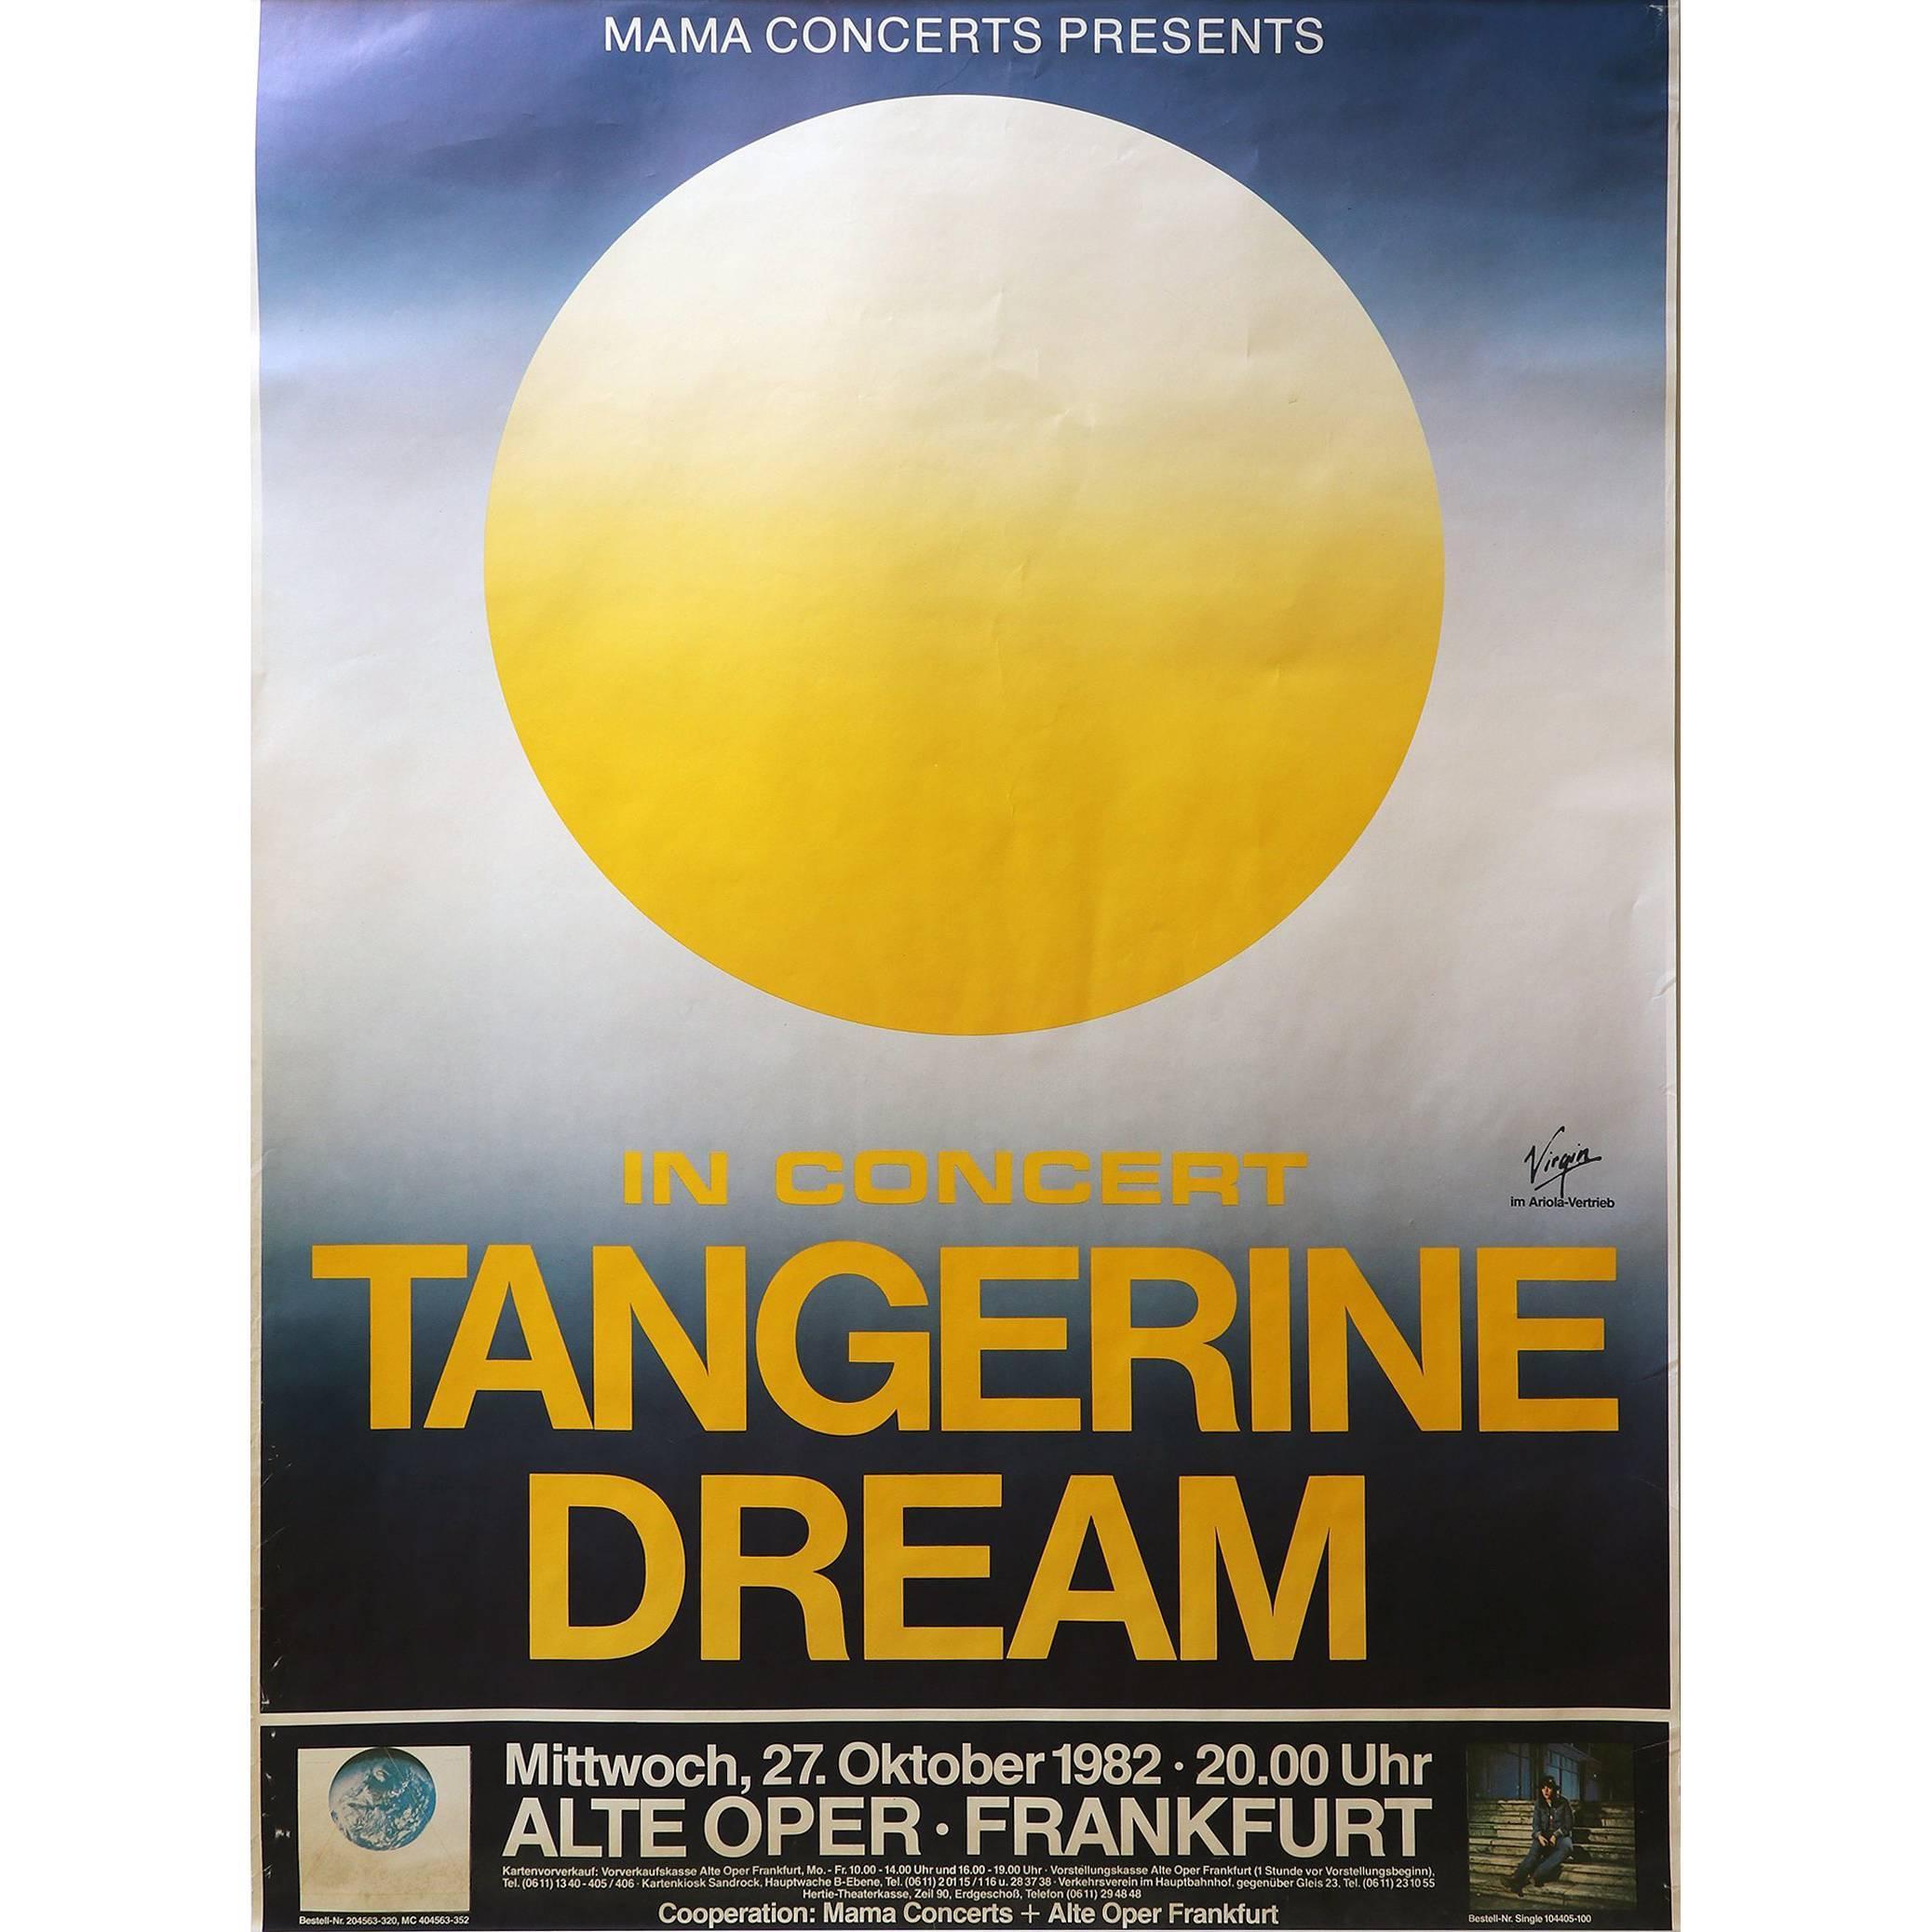 Tangerine Dream Concert Poster Alte Oper, Frankfurt, 1982